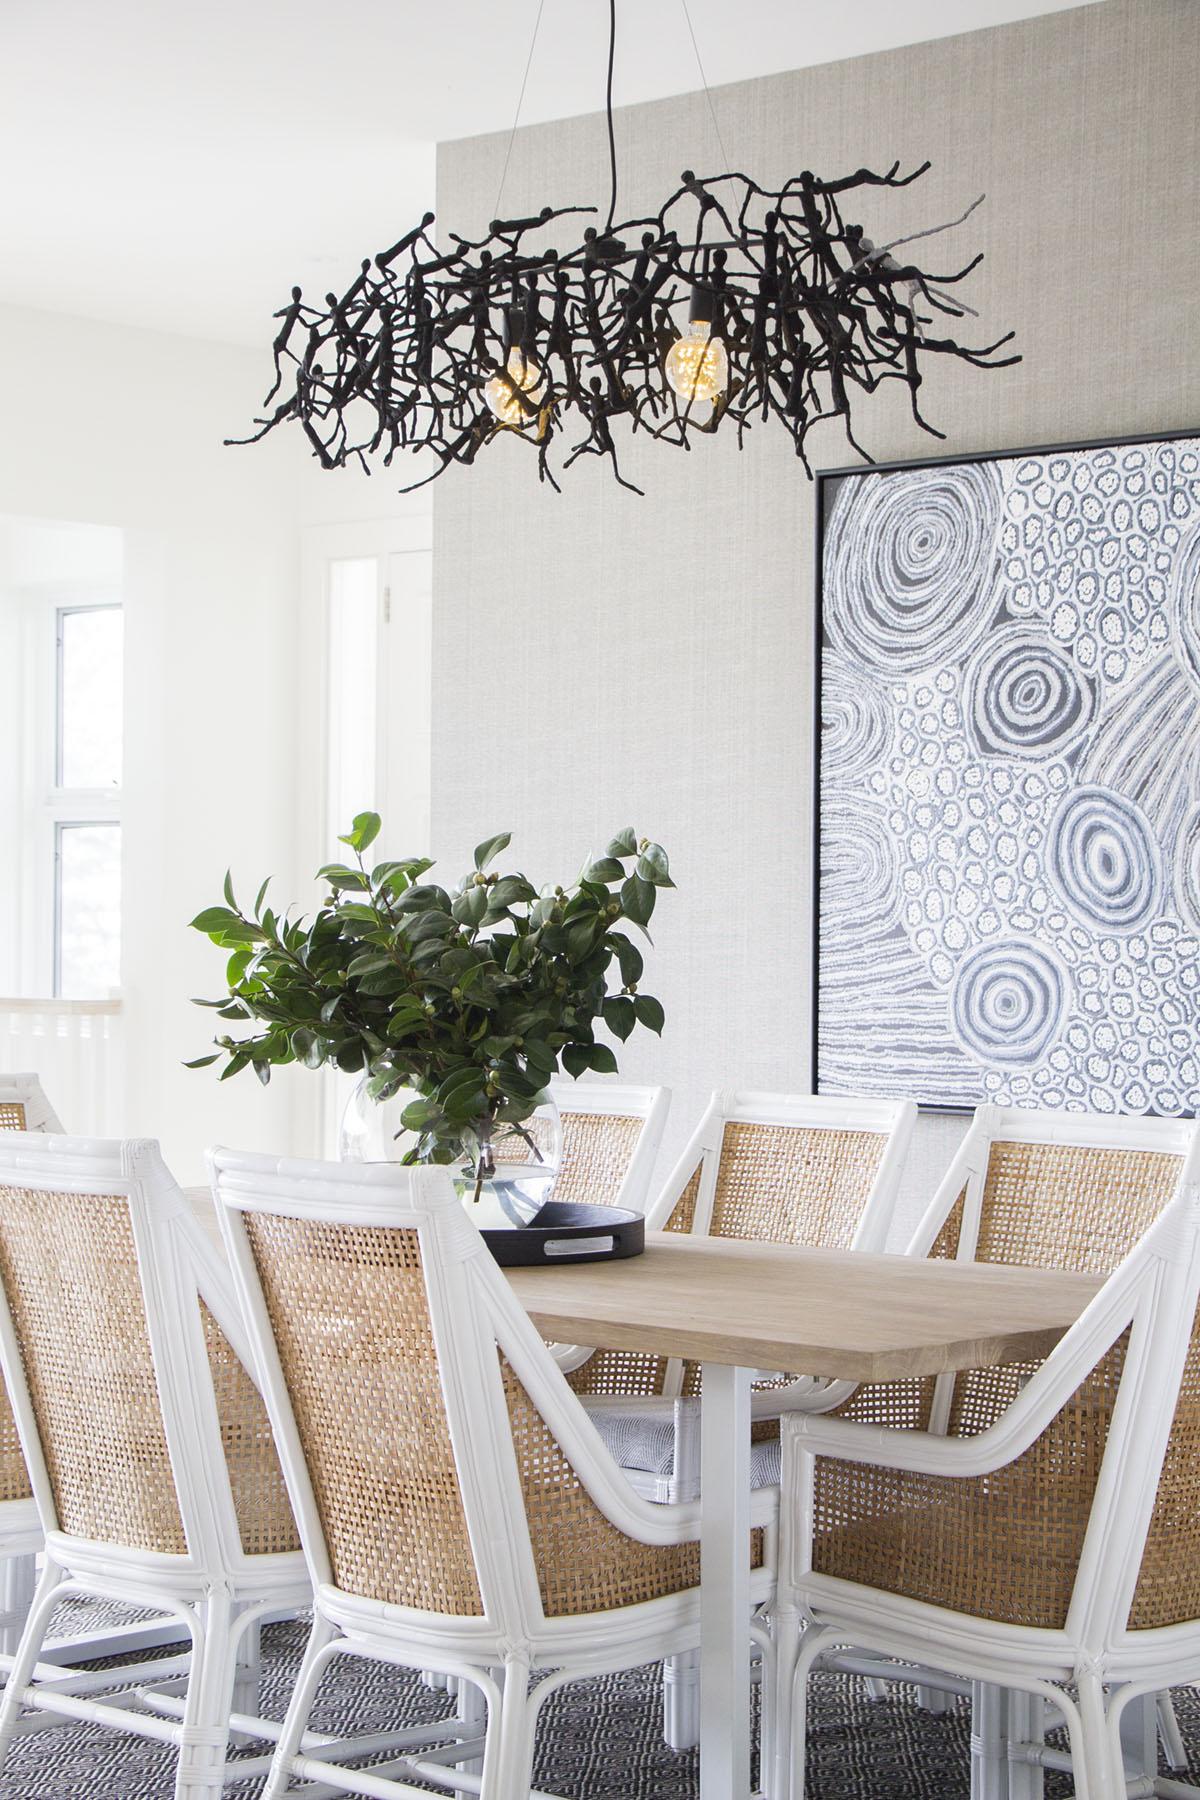 Design Scout - Interior Design - Jacinta Platt - Gold Coast Interior Designer - Photography by Tanika Blair - IMG_3324 - small.jpg